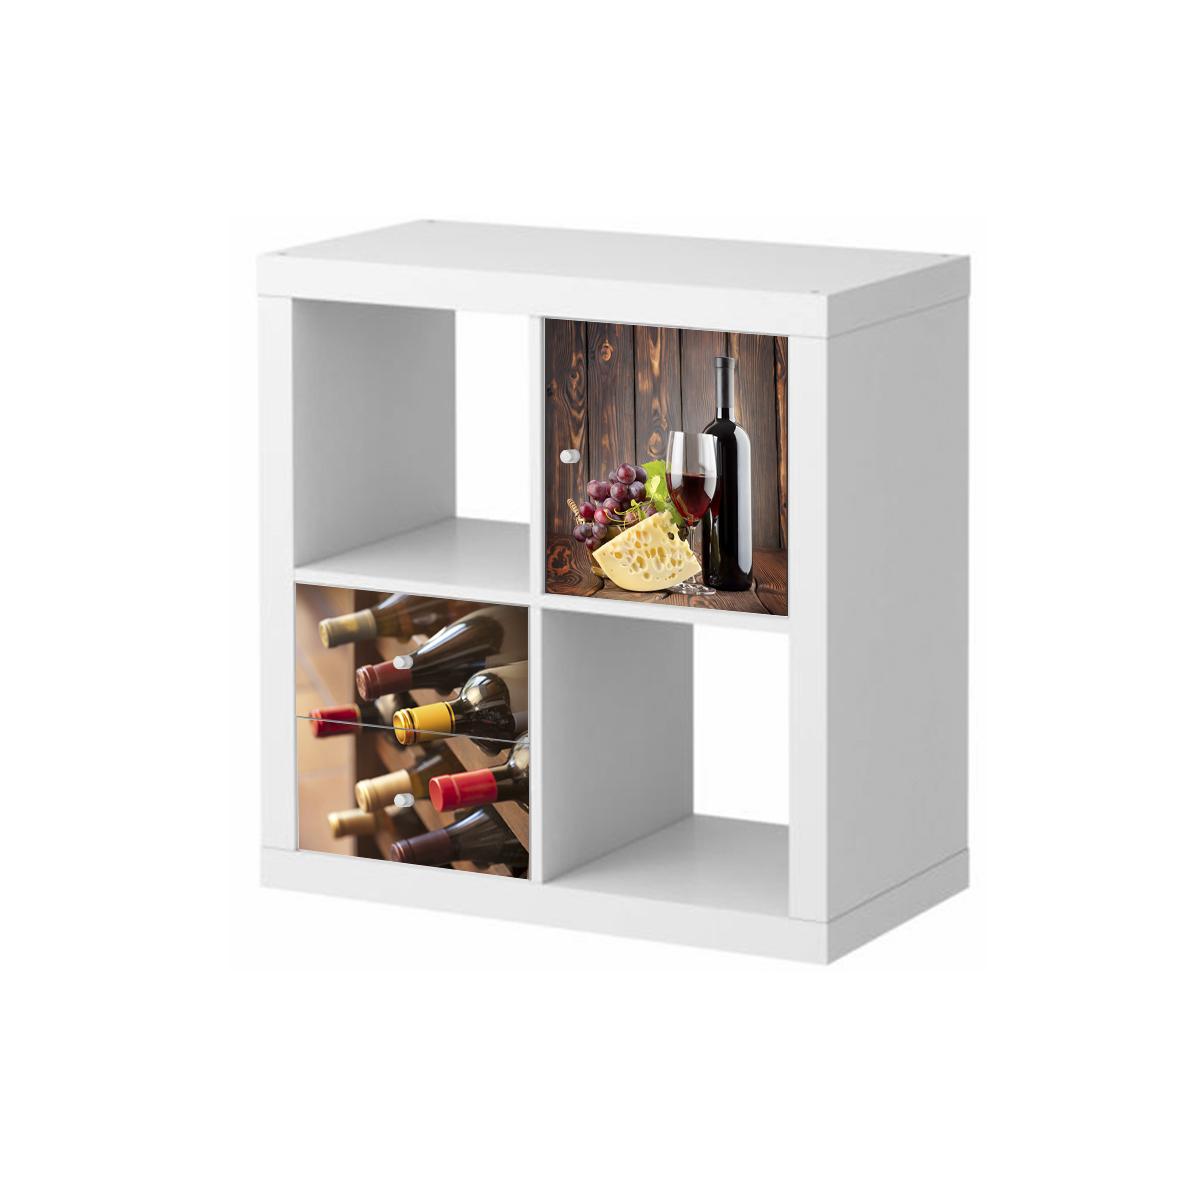 Stickers meubles ikea stickers meubles ikea vin et - Ikea stickers chambre ...